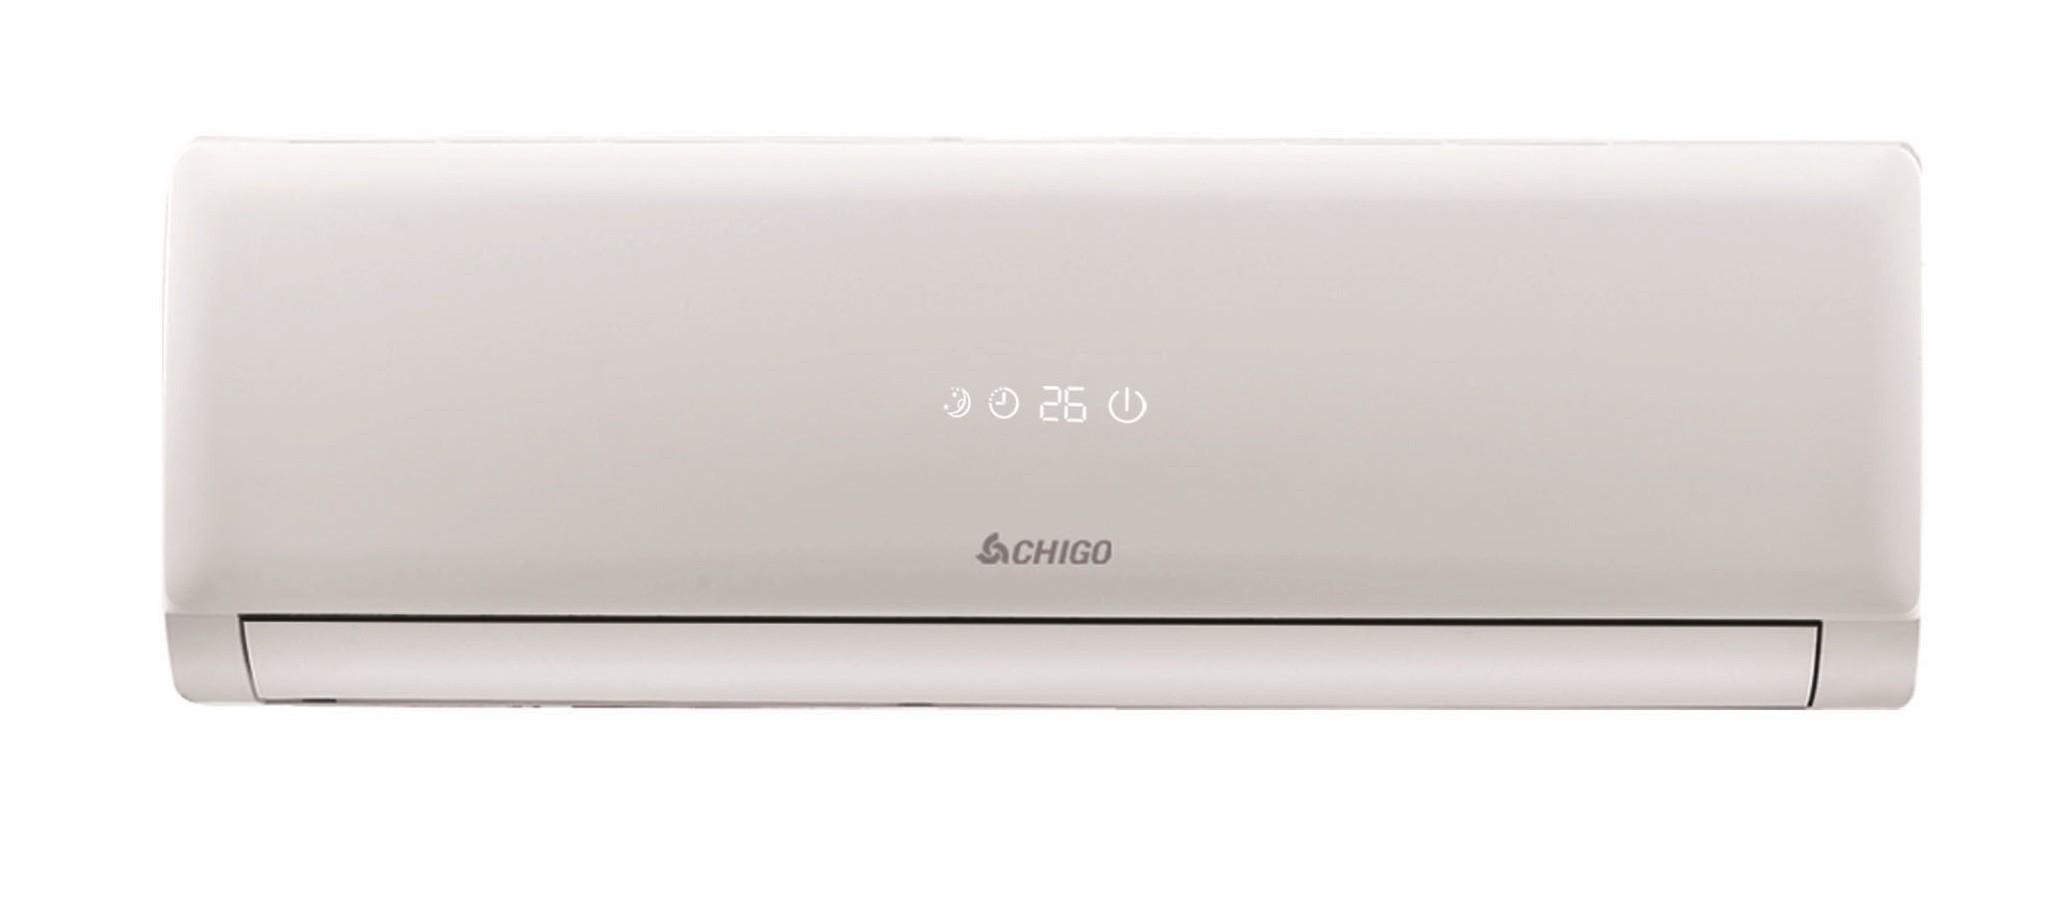 Инверторен климатик CHIGO, модел:CS-35V3A-1C169AY4J